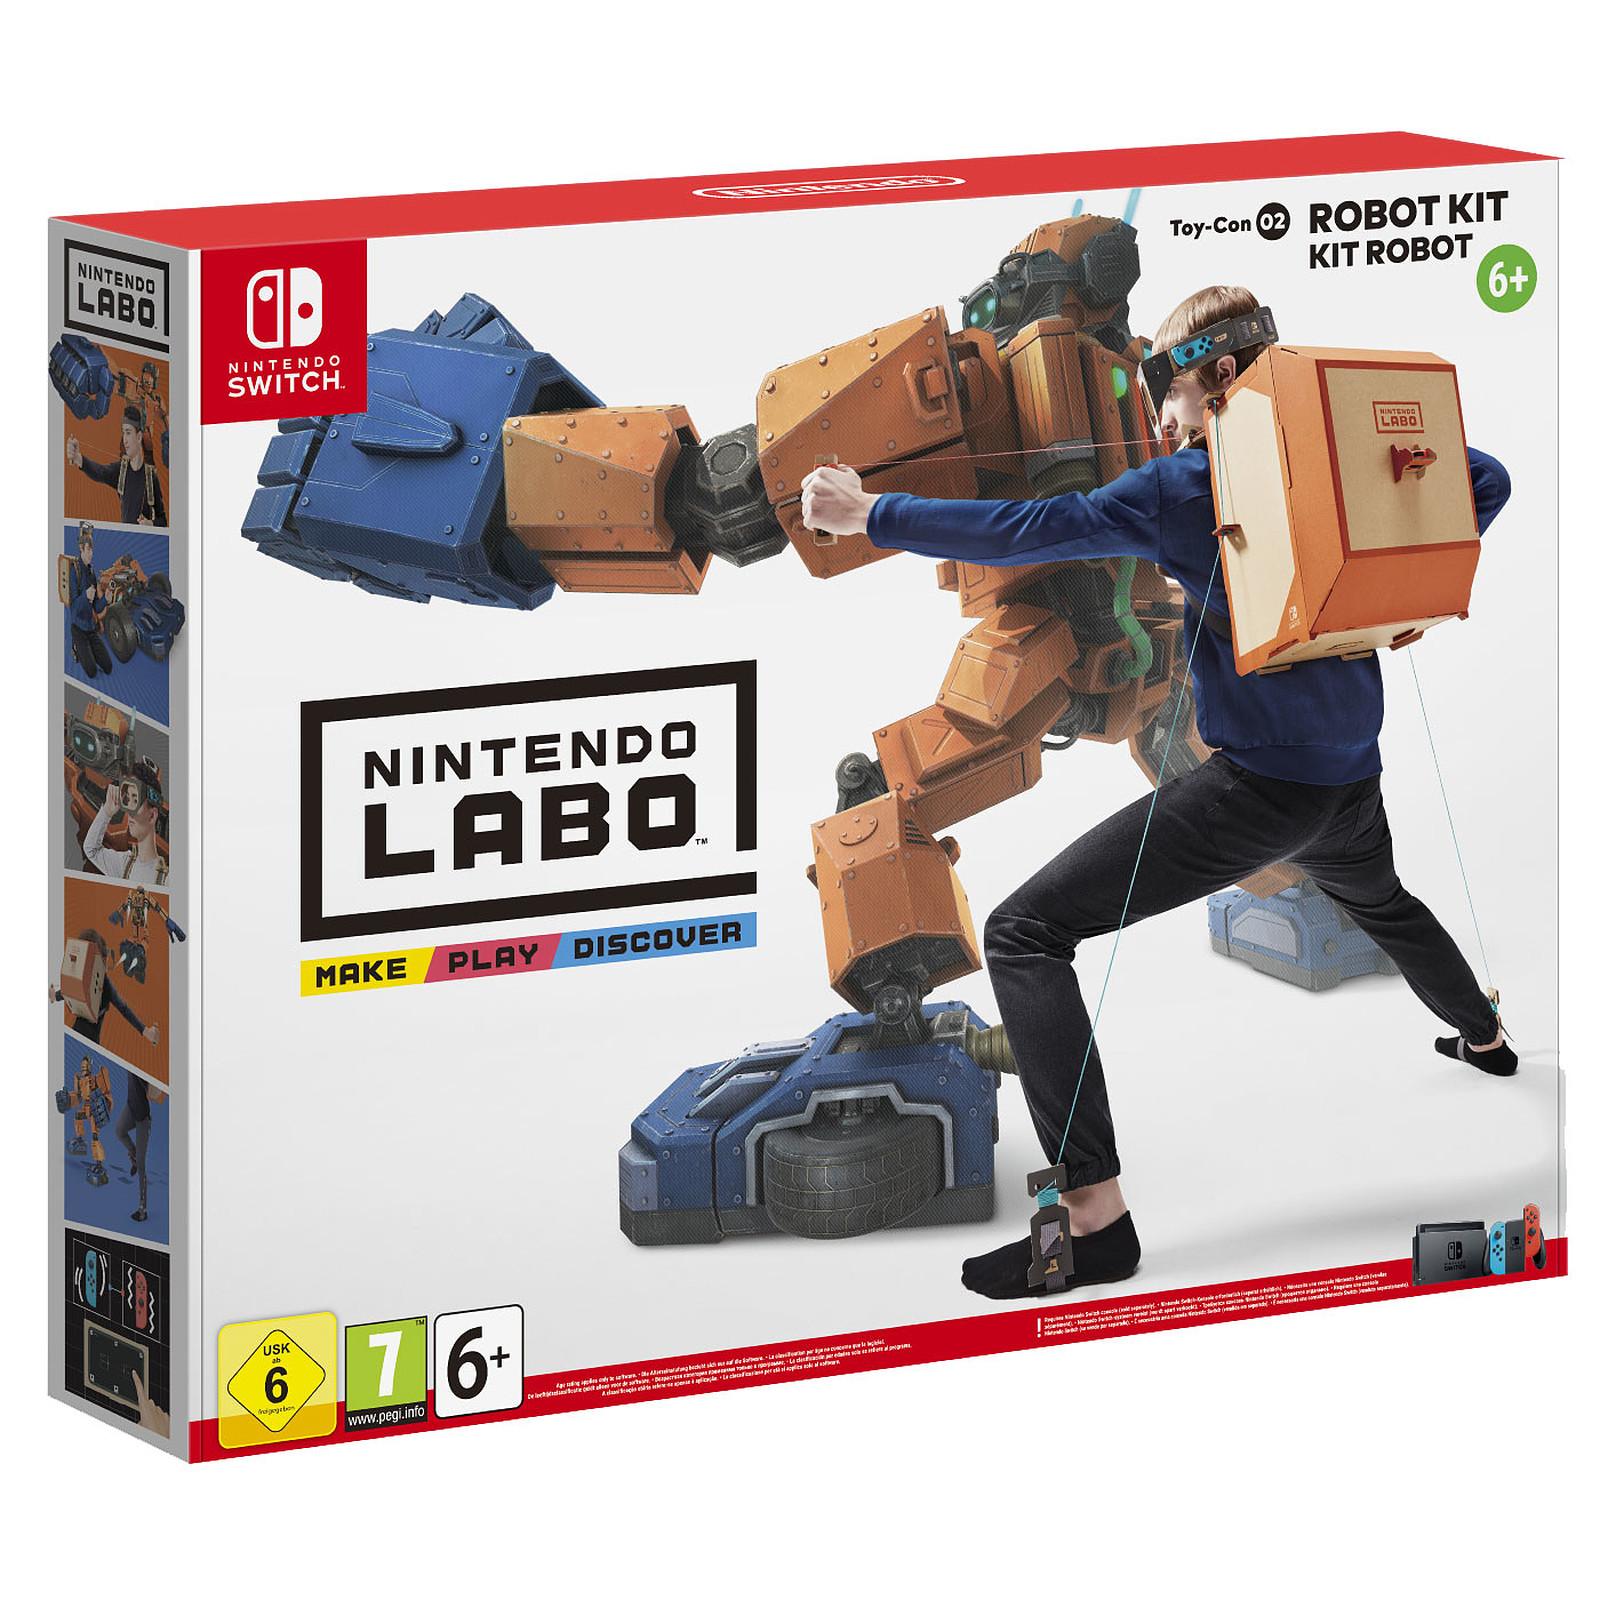 Nintendo Labo (Kit Robot)